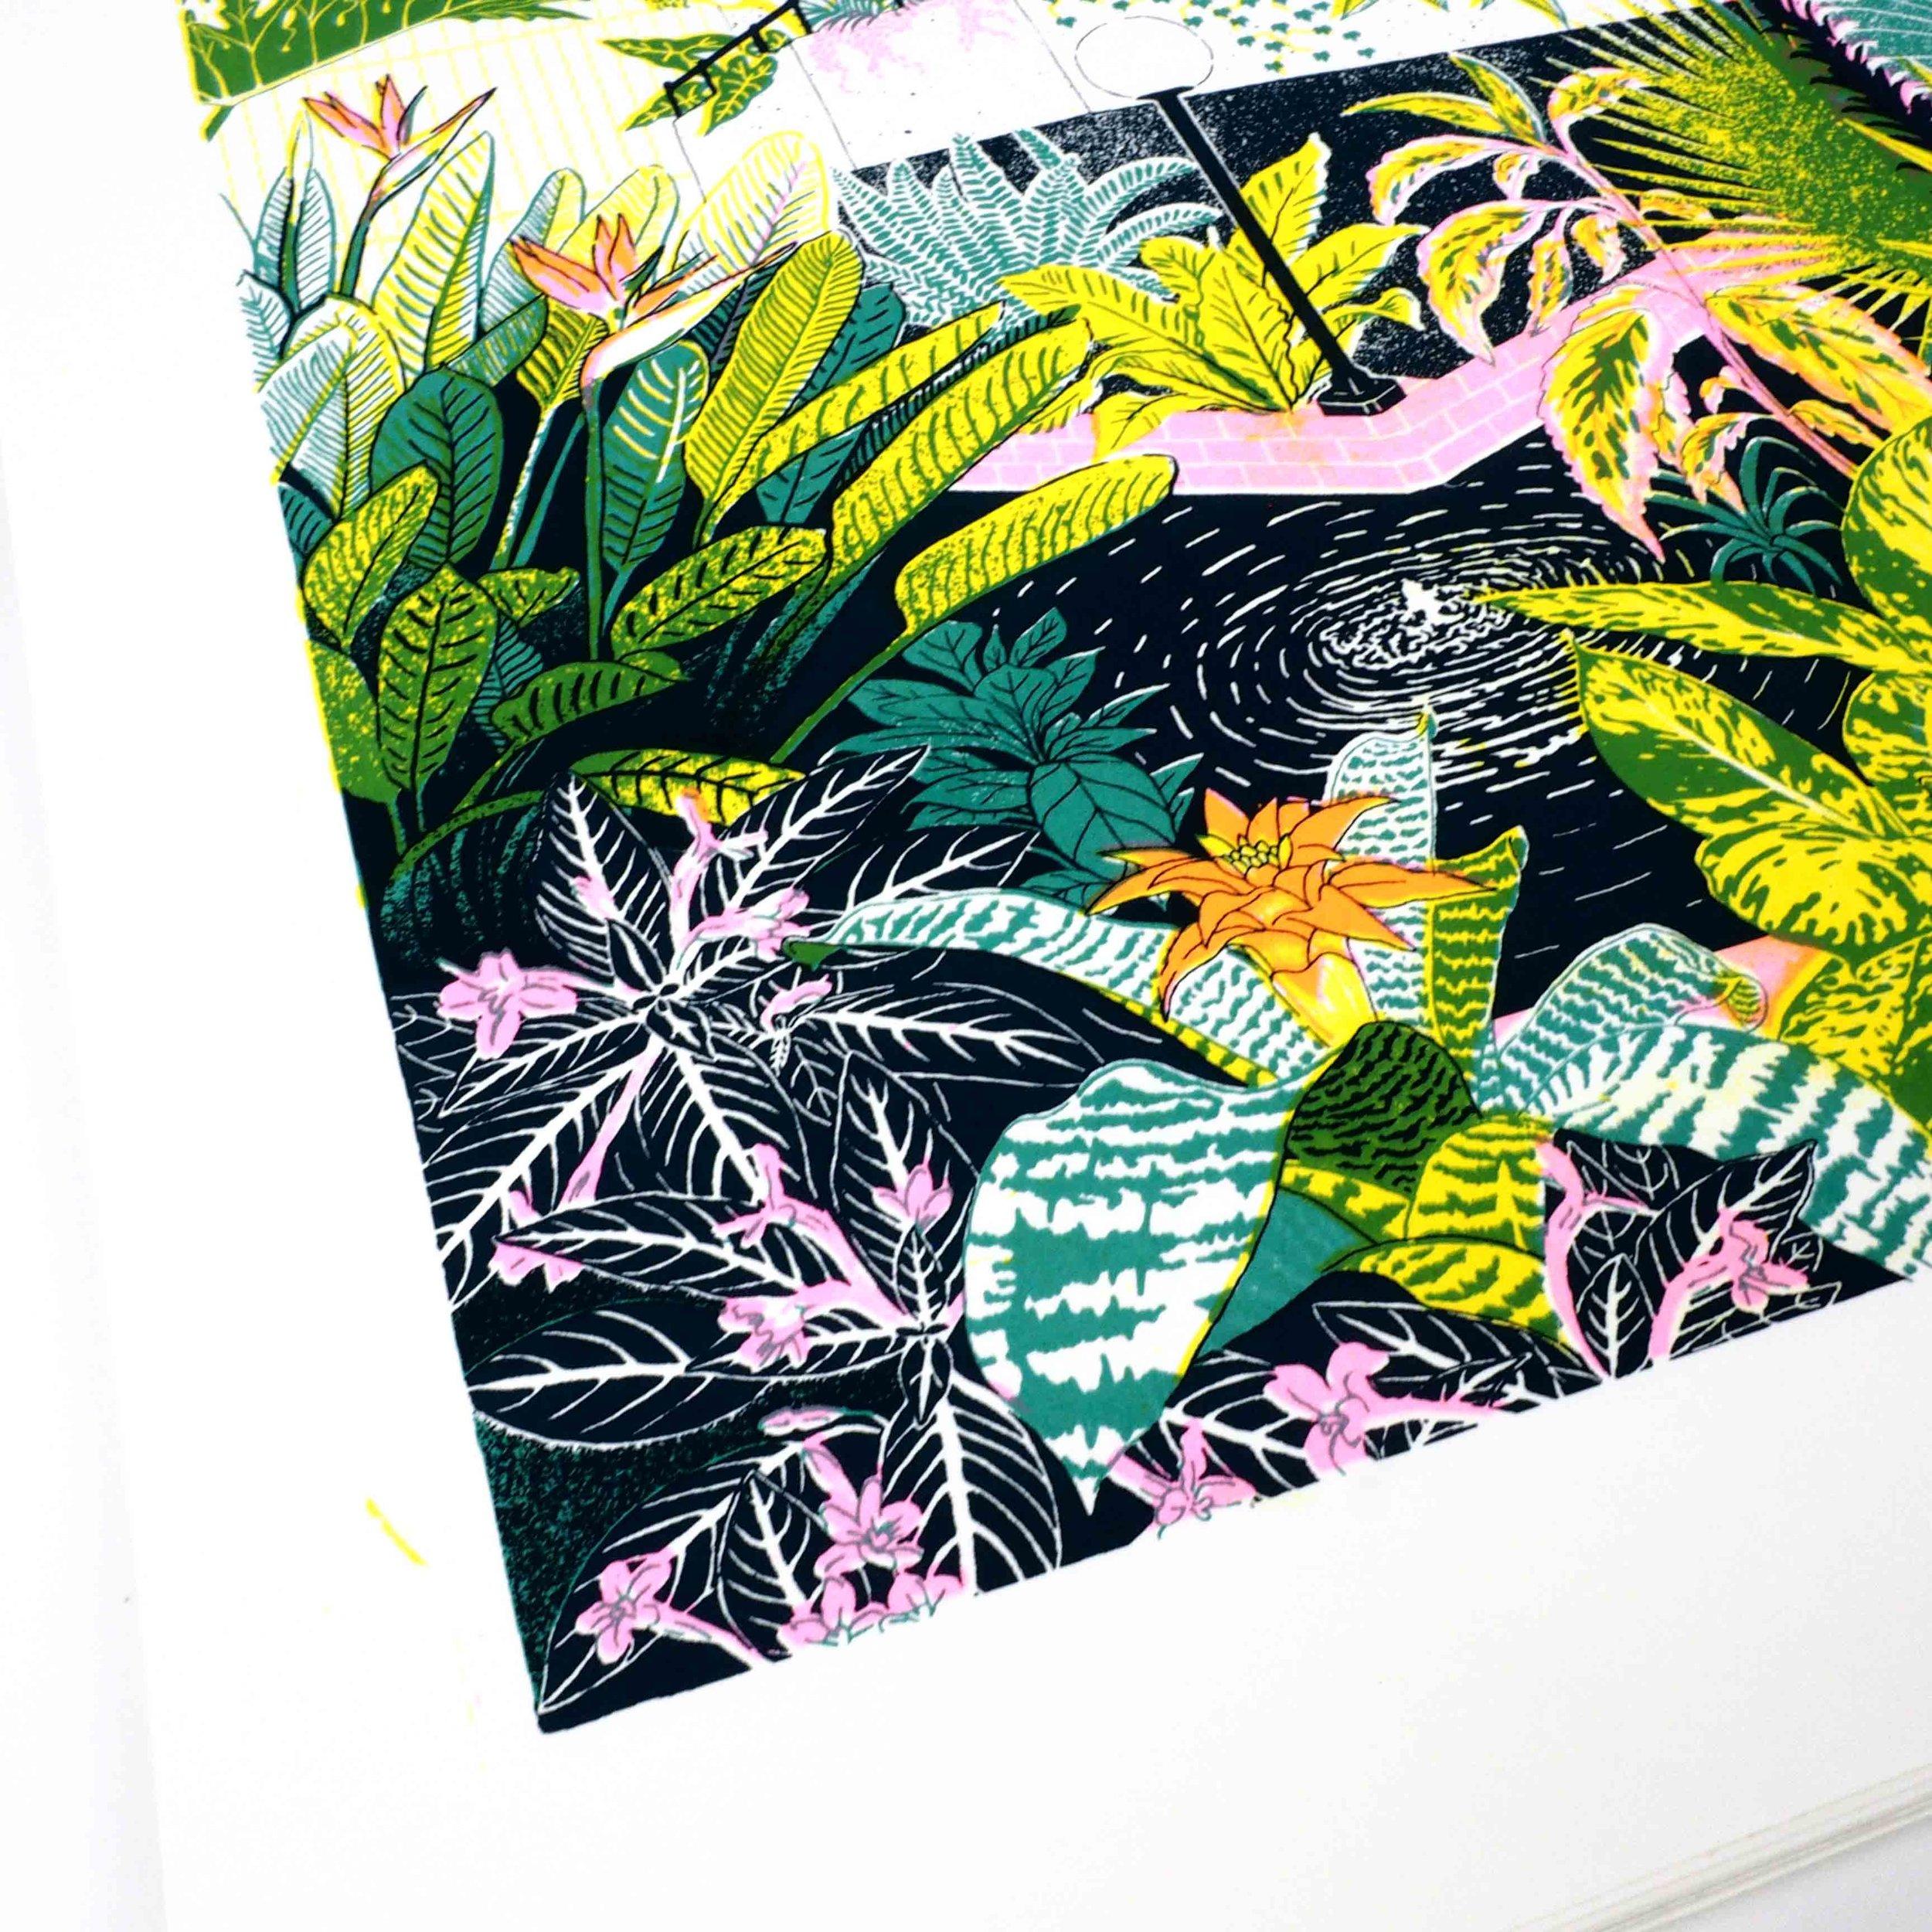 Barbican-Conservatory-Jungle-Screen-Print-3sm.jpg